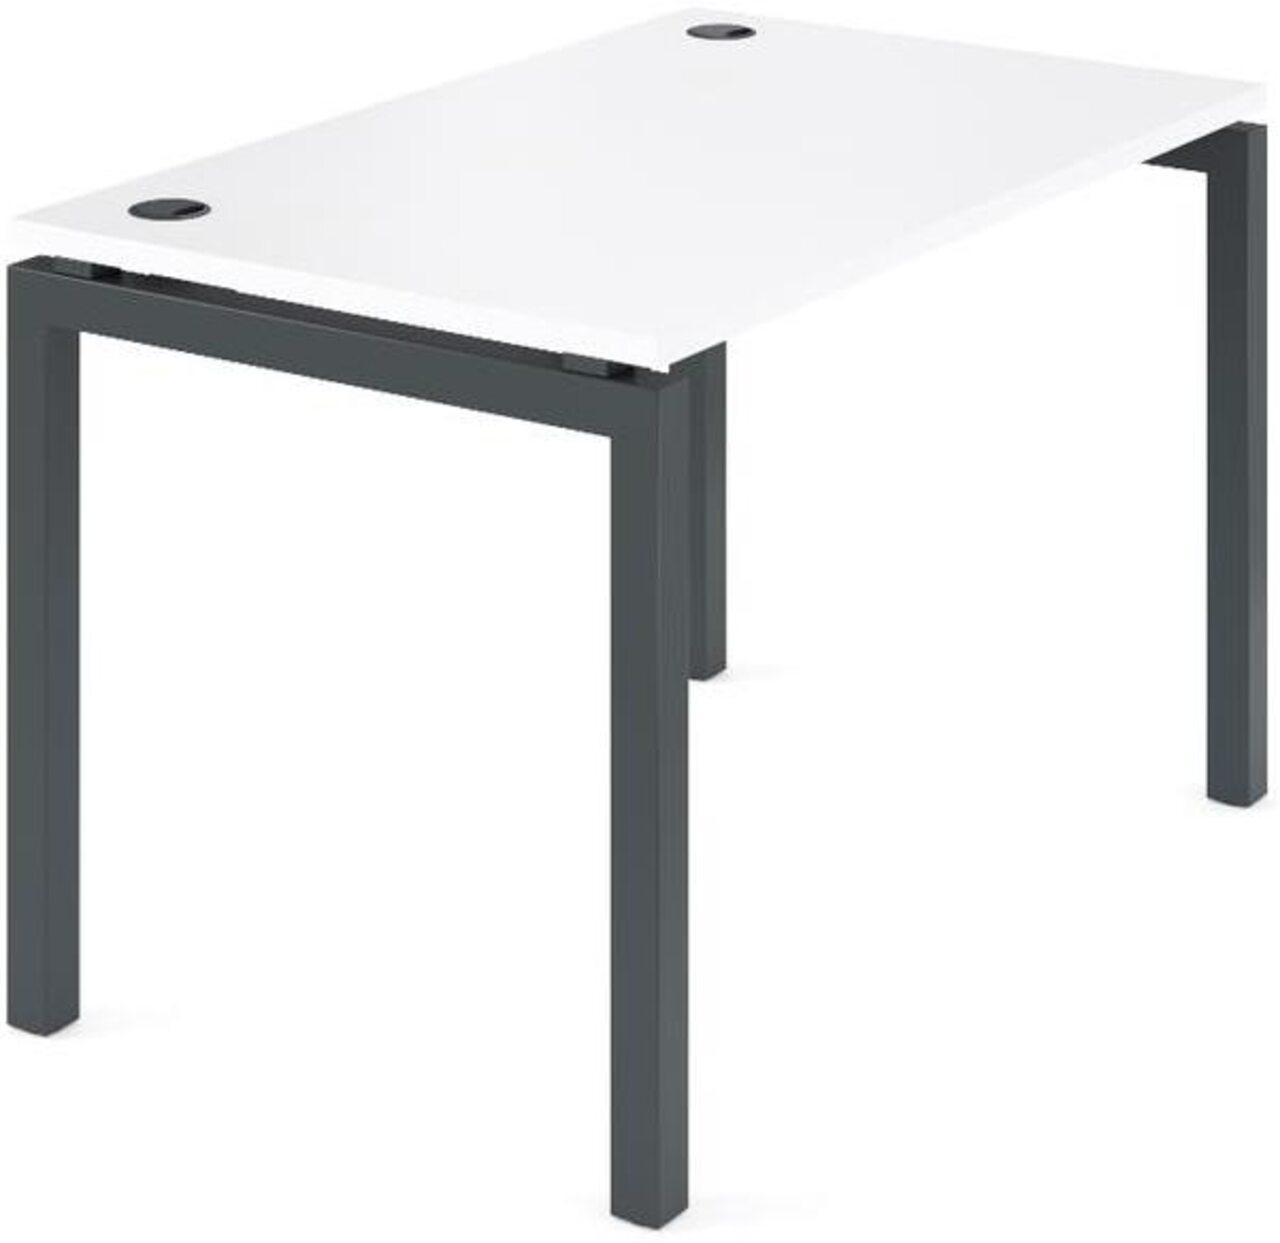 Стол на металлокаркасе  Арго 120x73x76 - фото 5